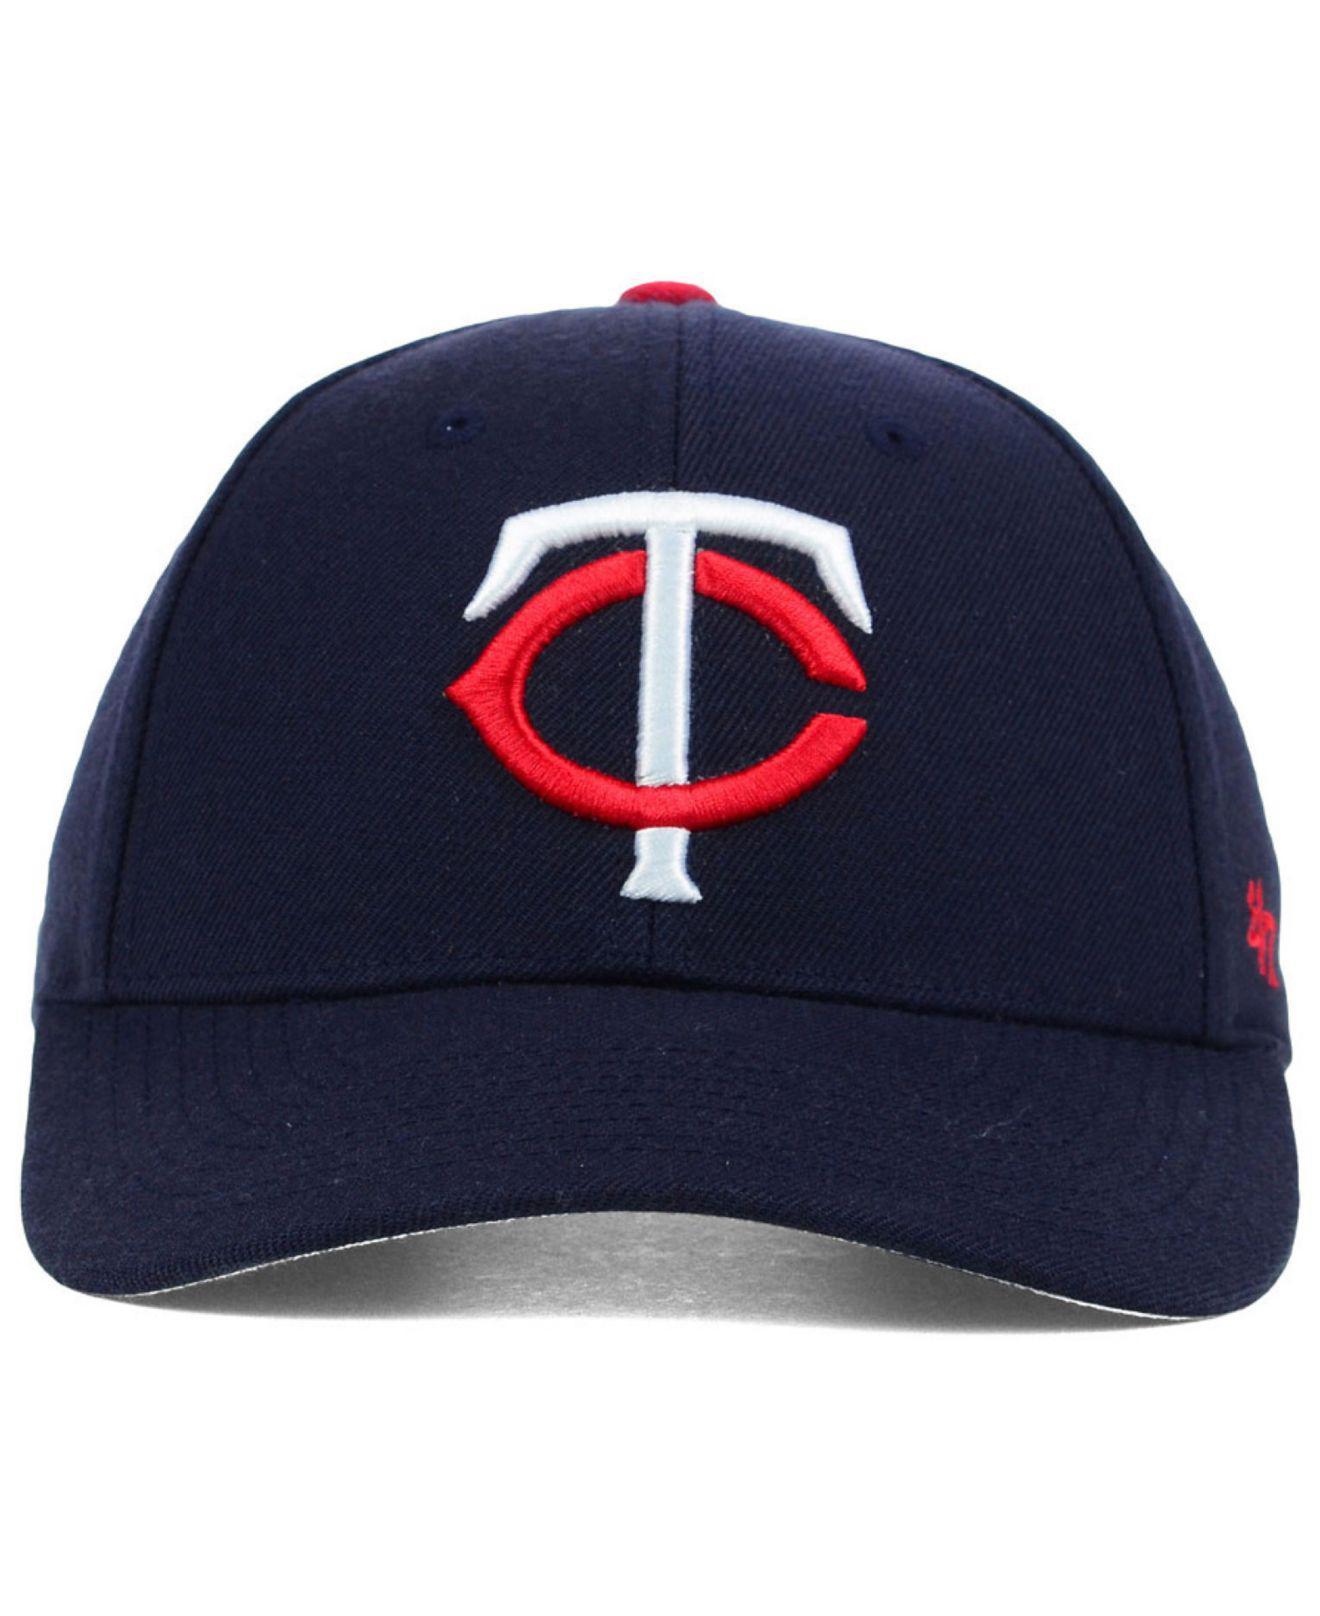 online store c872f 4c13d ... best lyst 47 brand minnesota twins mvp curved cap in blue for men f1cb2  a8d70